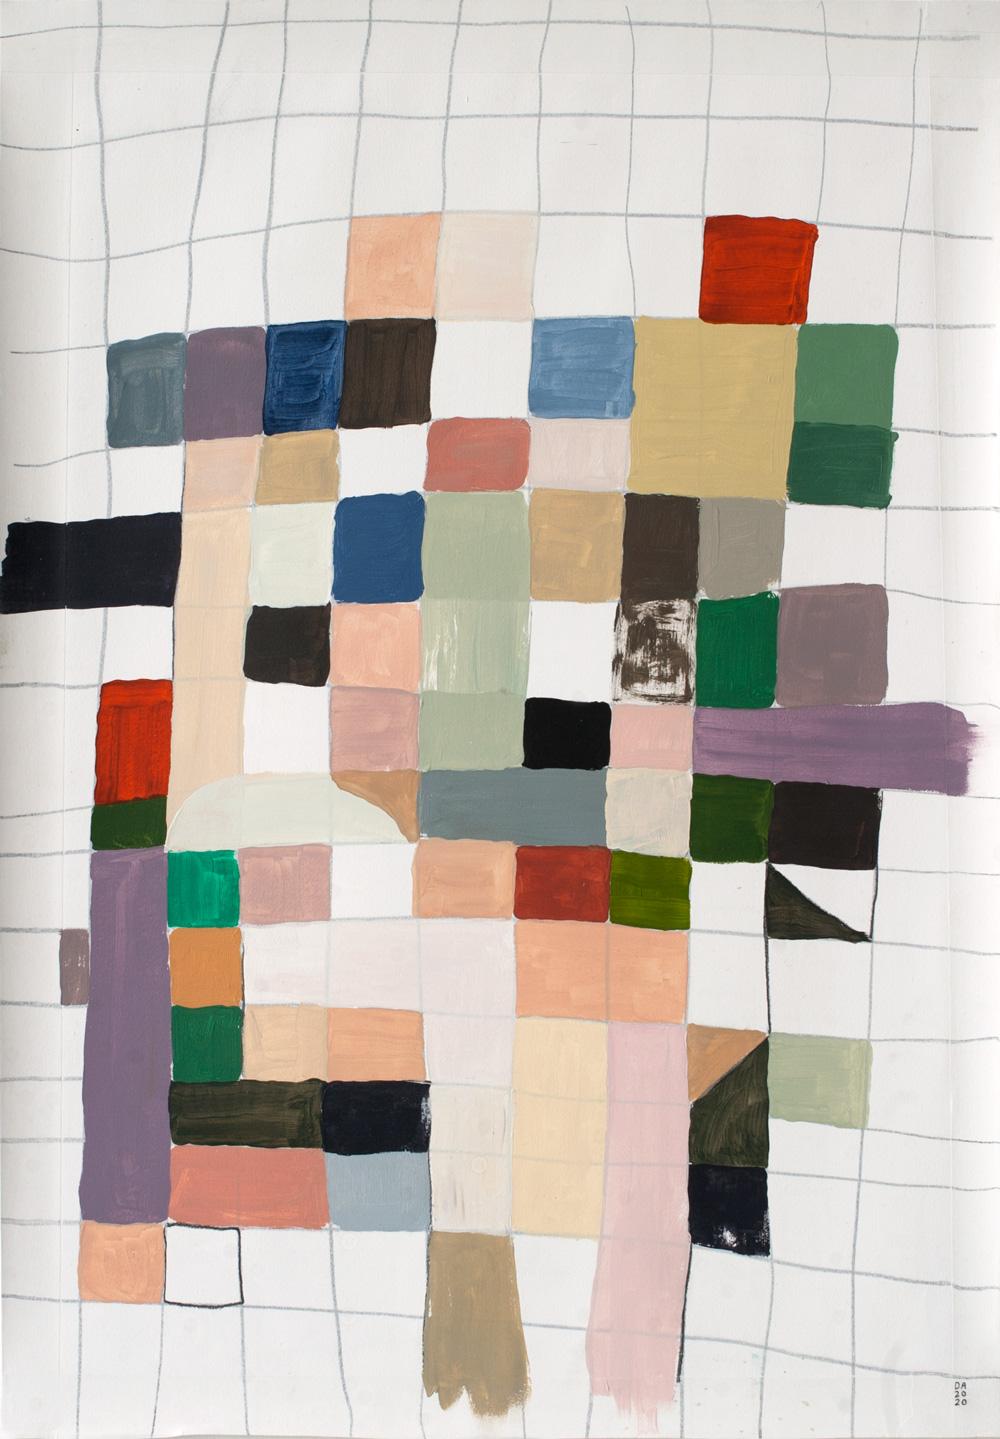 2020-DA-Painting-ot-FotoAP_DSC3620-web